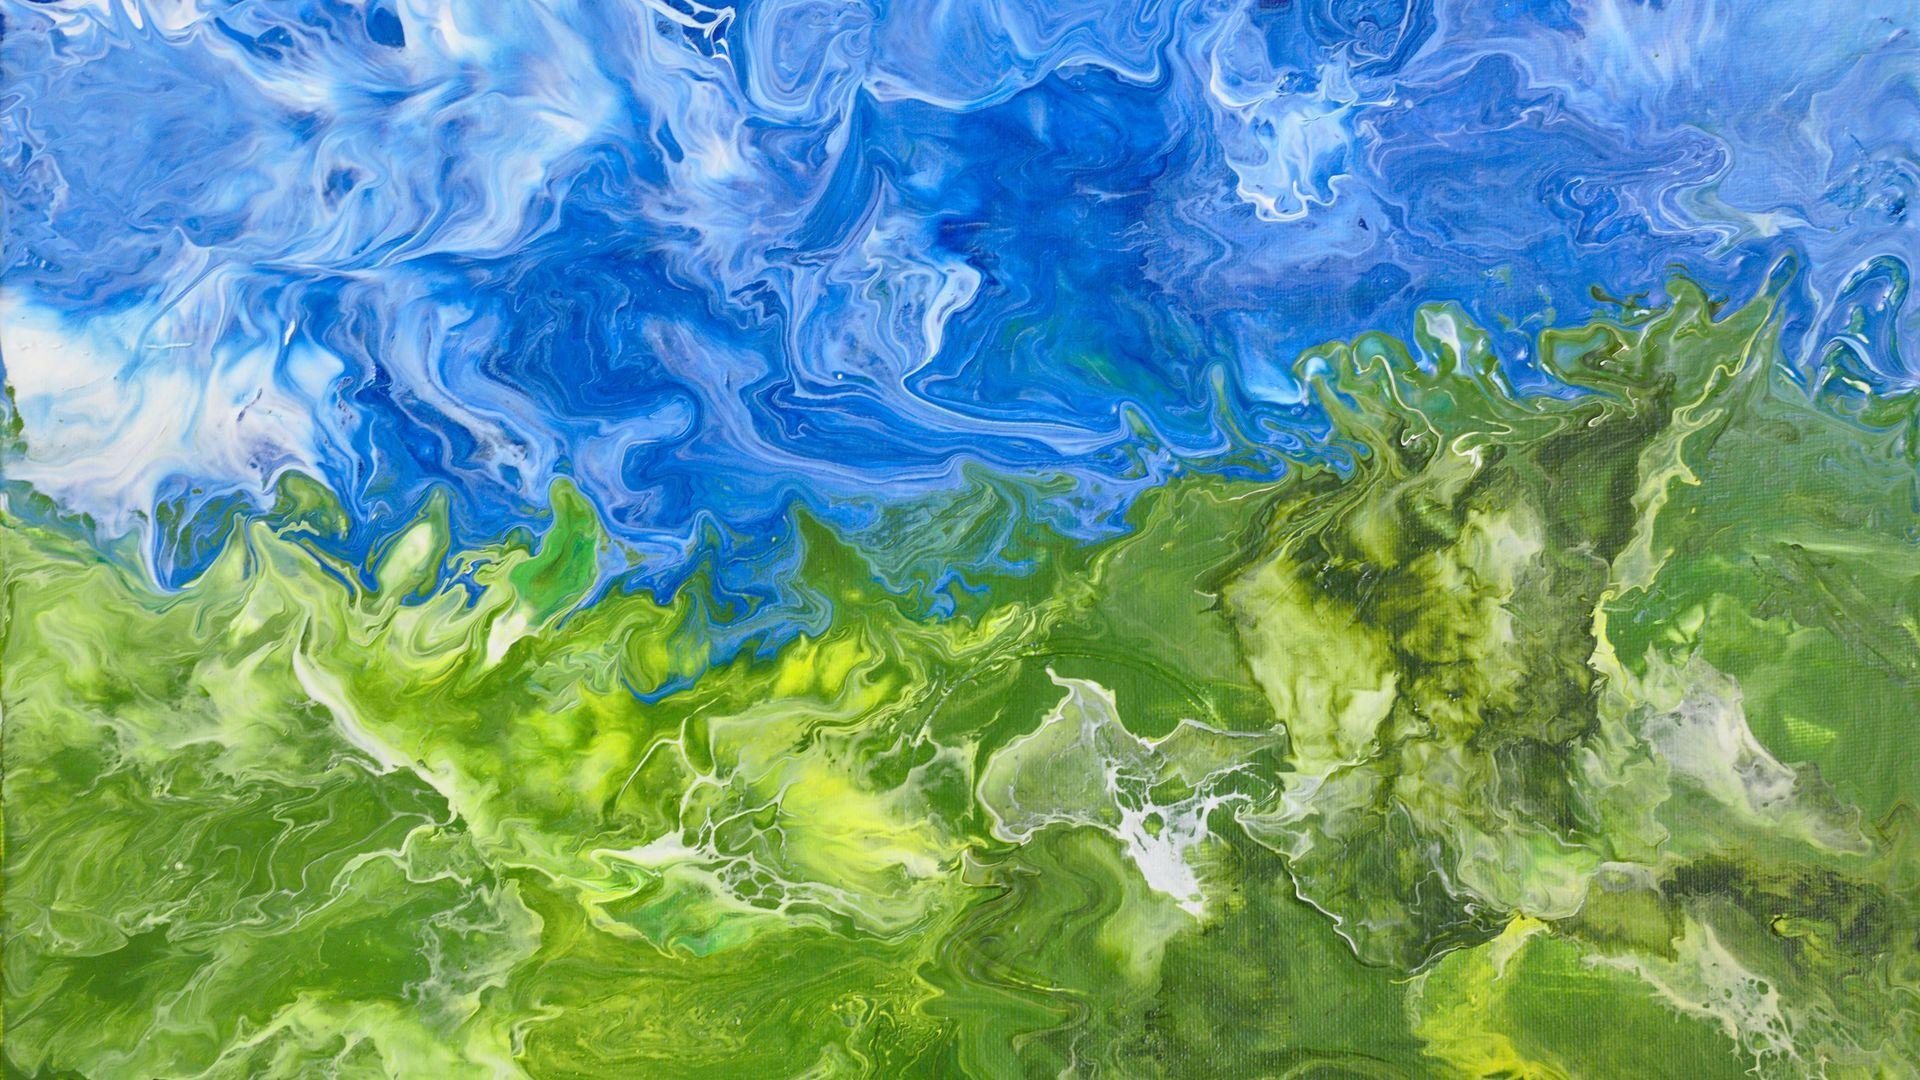 Wallpaper Liquid Paint Fluid Art Stains Spots